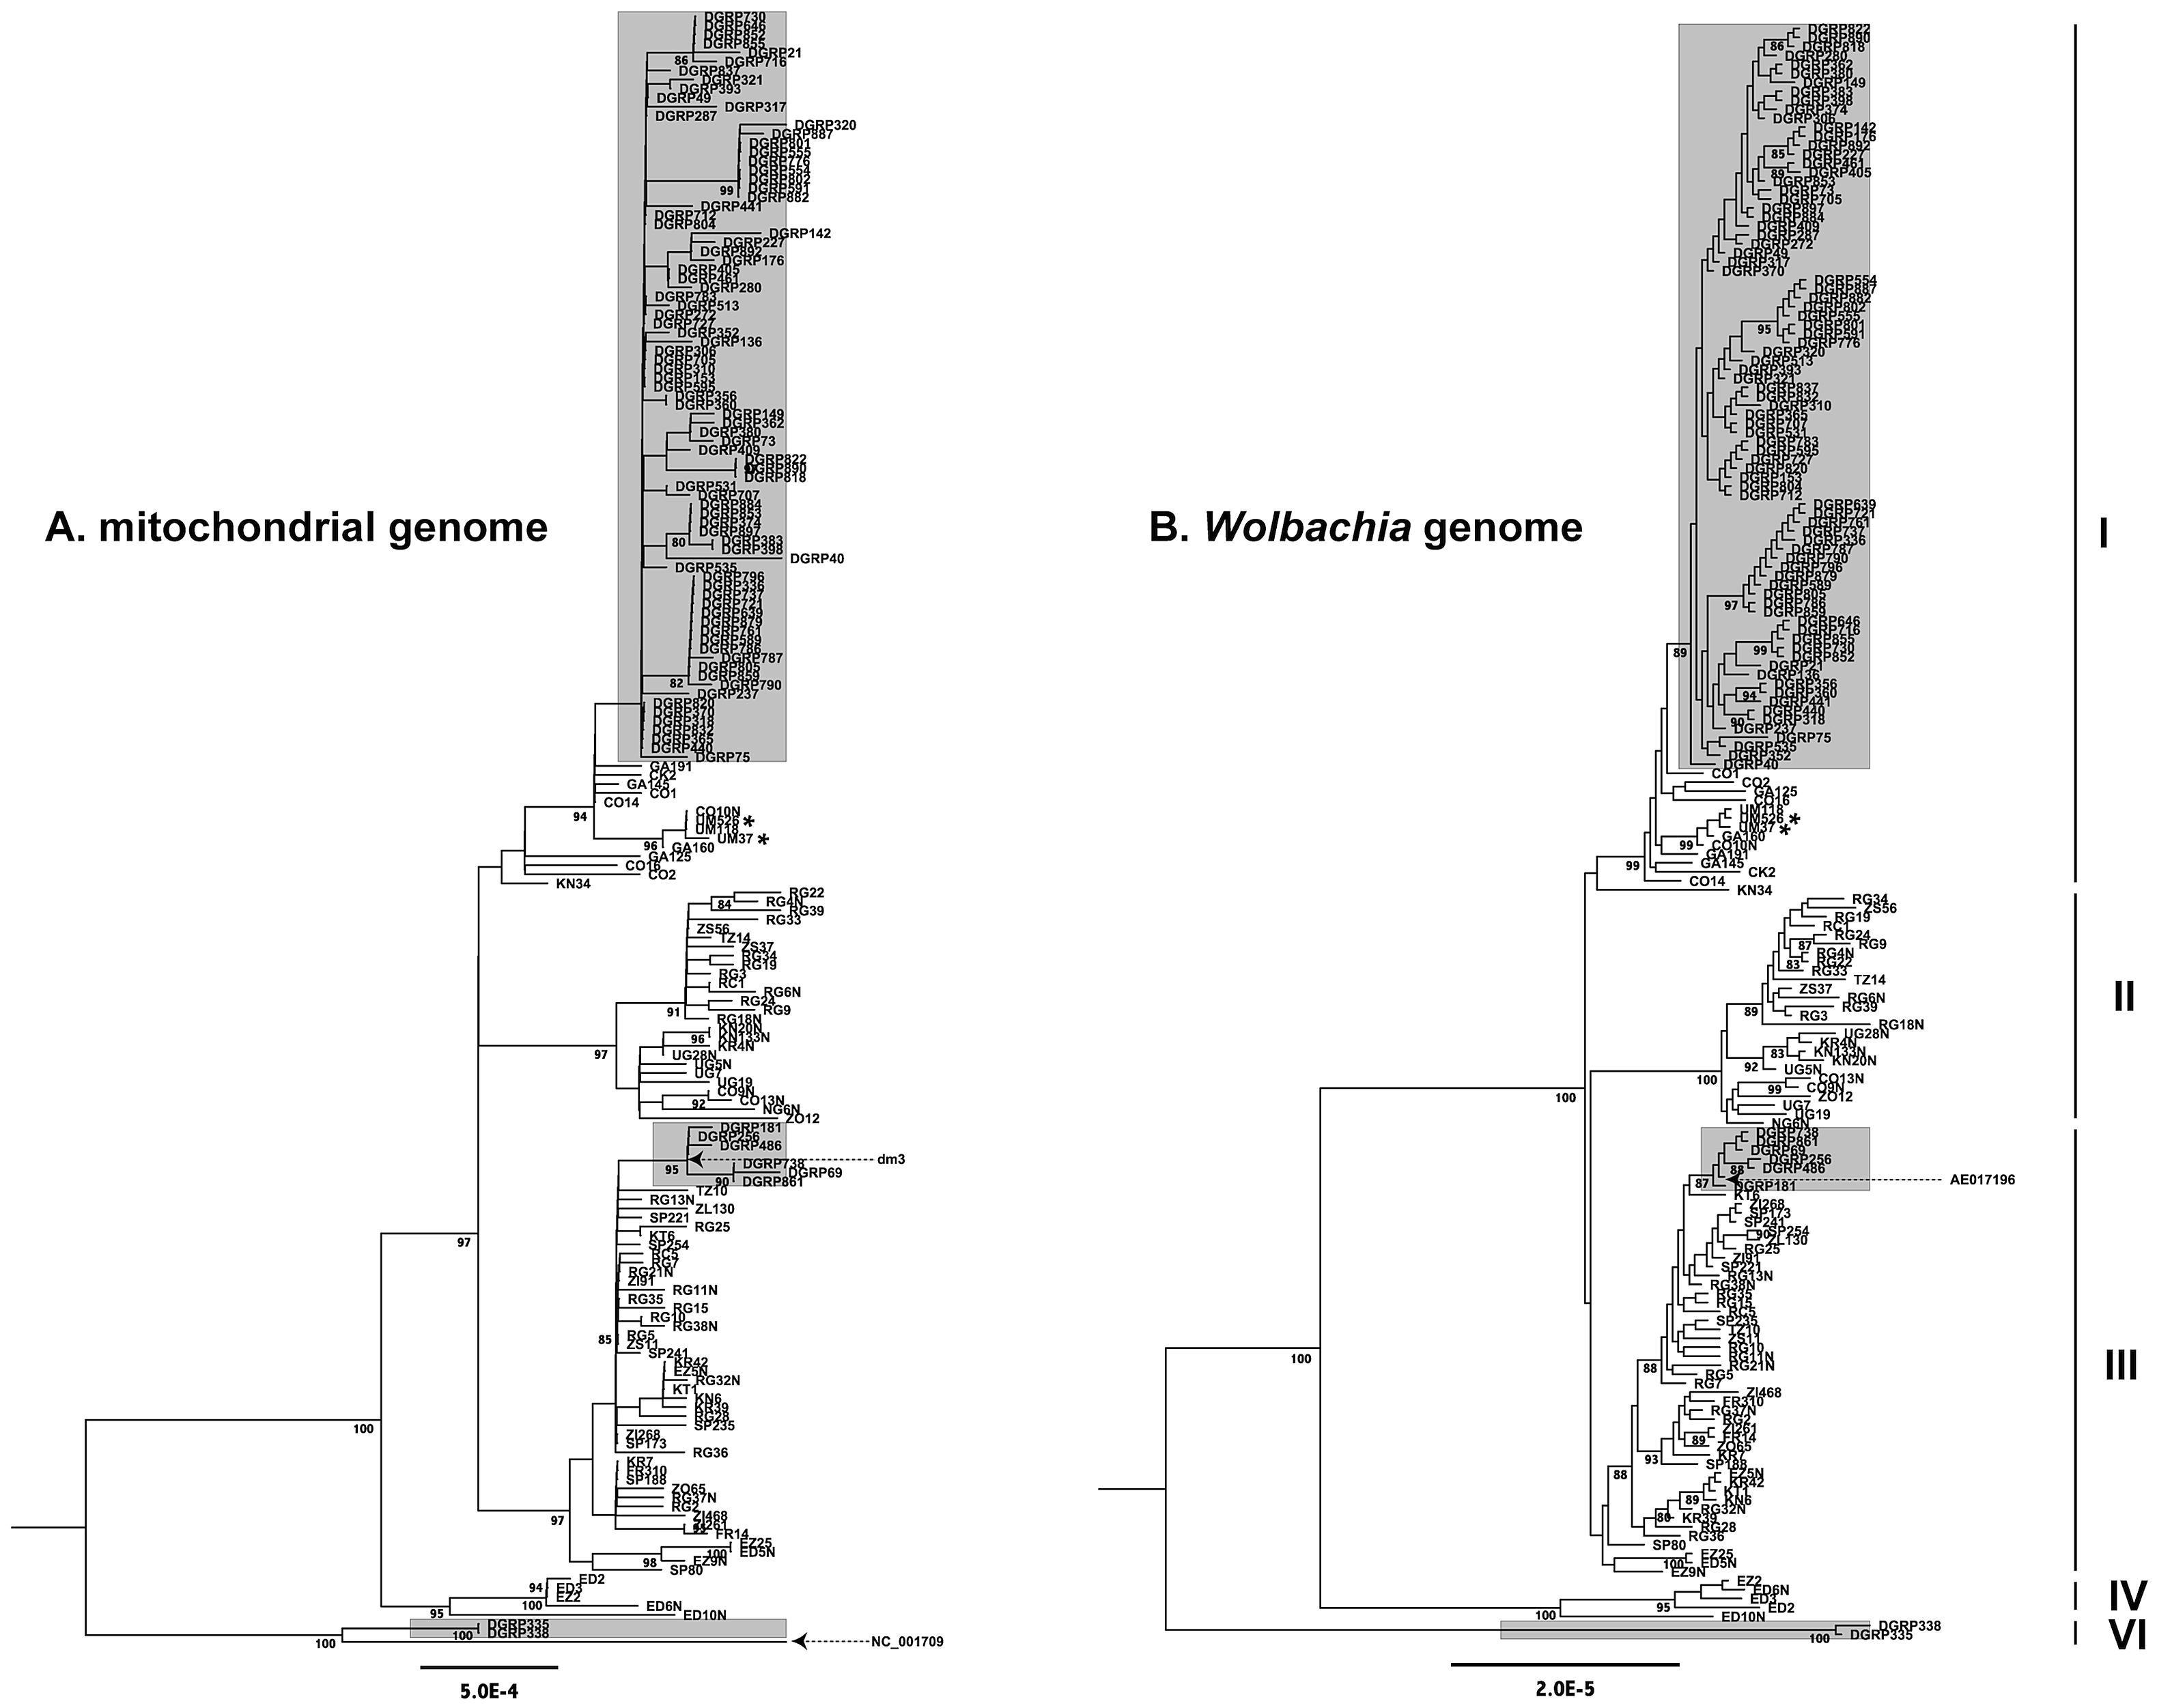 Maximum likelihood genealogies.